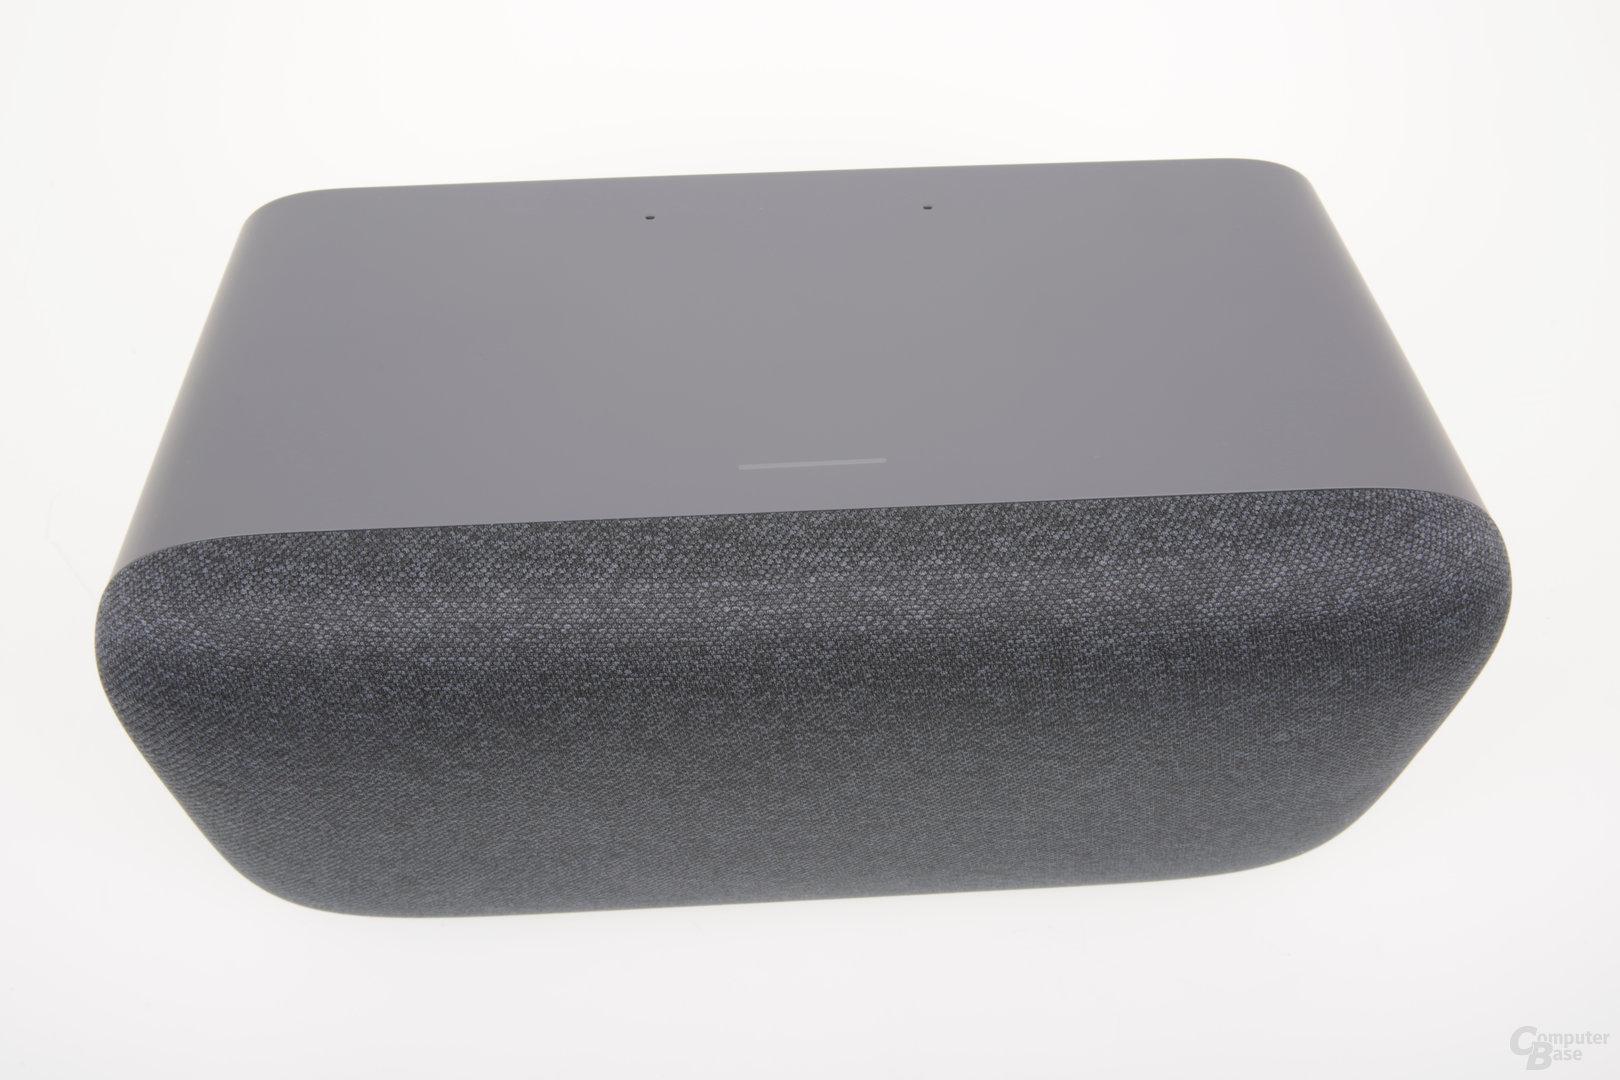 Touch-Bedienfläche an der Oberseite